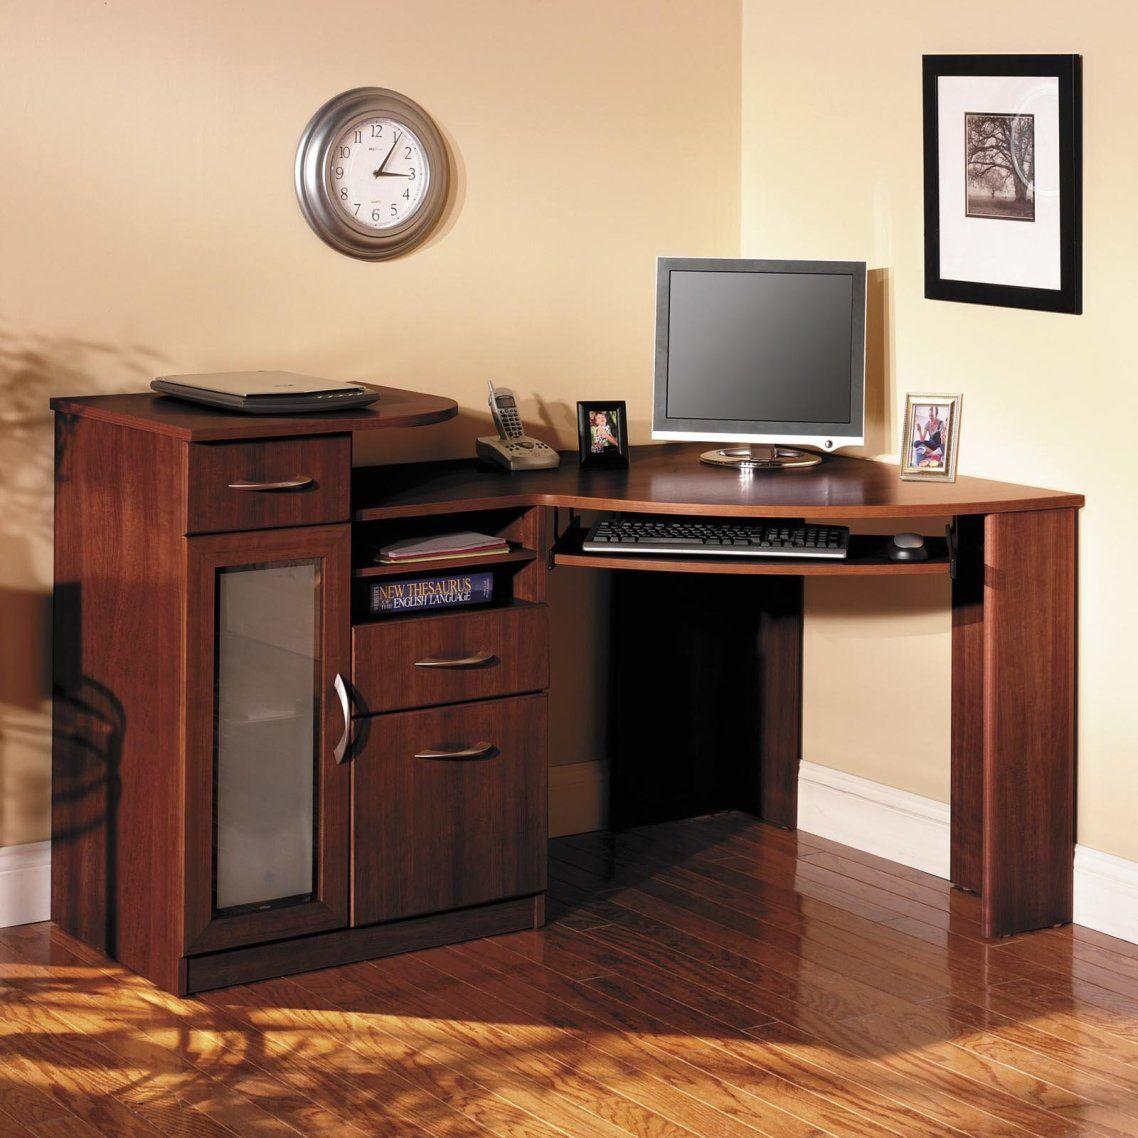 55 cheap corner computer desks for home best paint for furniture rh pinterest co uk cheap corner computer desk uk cheap corner computer desk with hutch